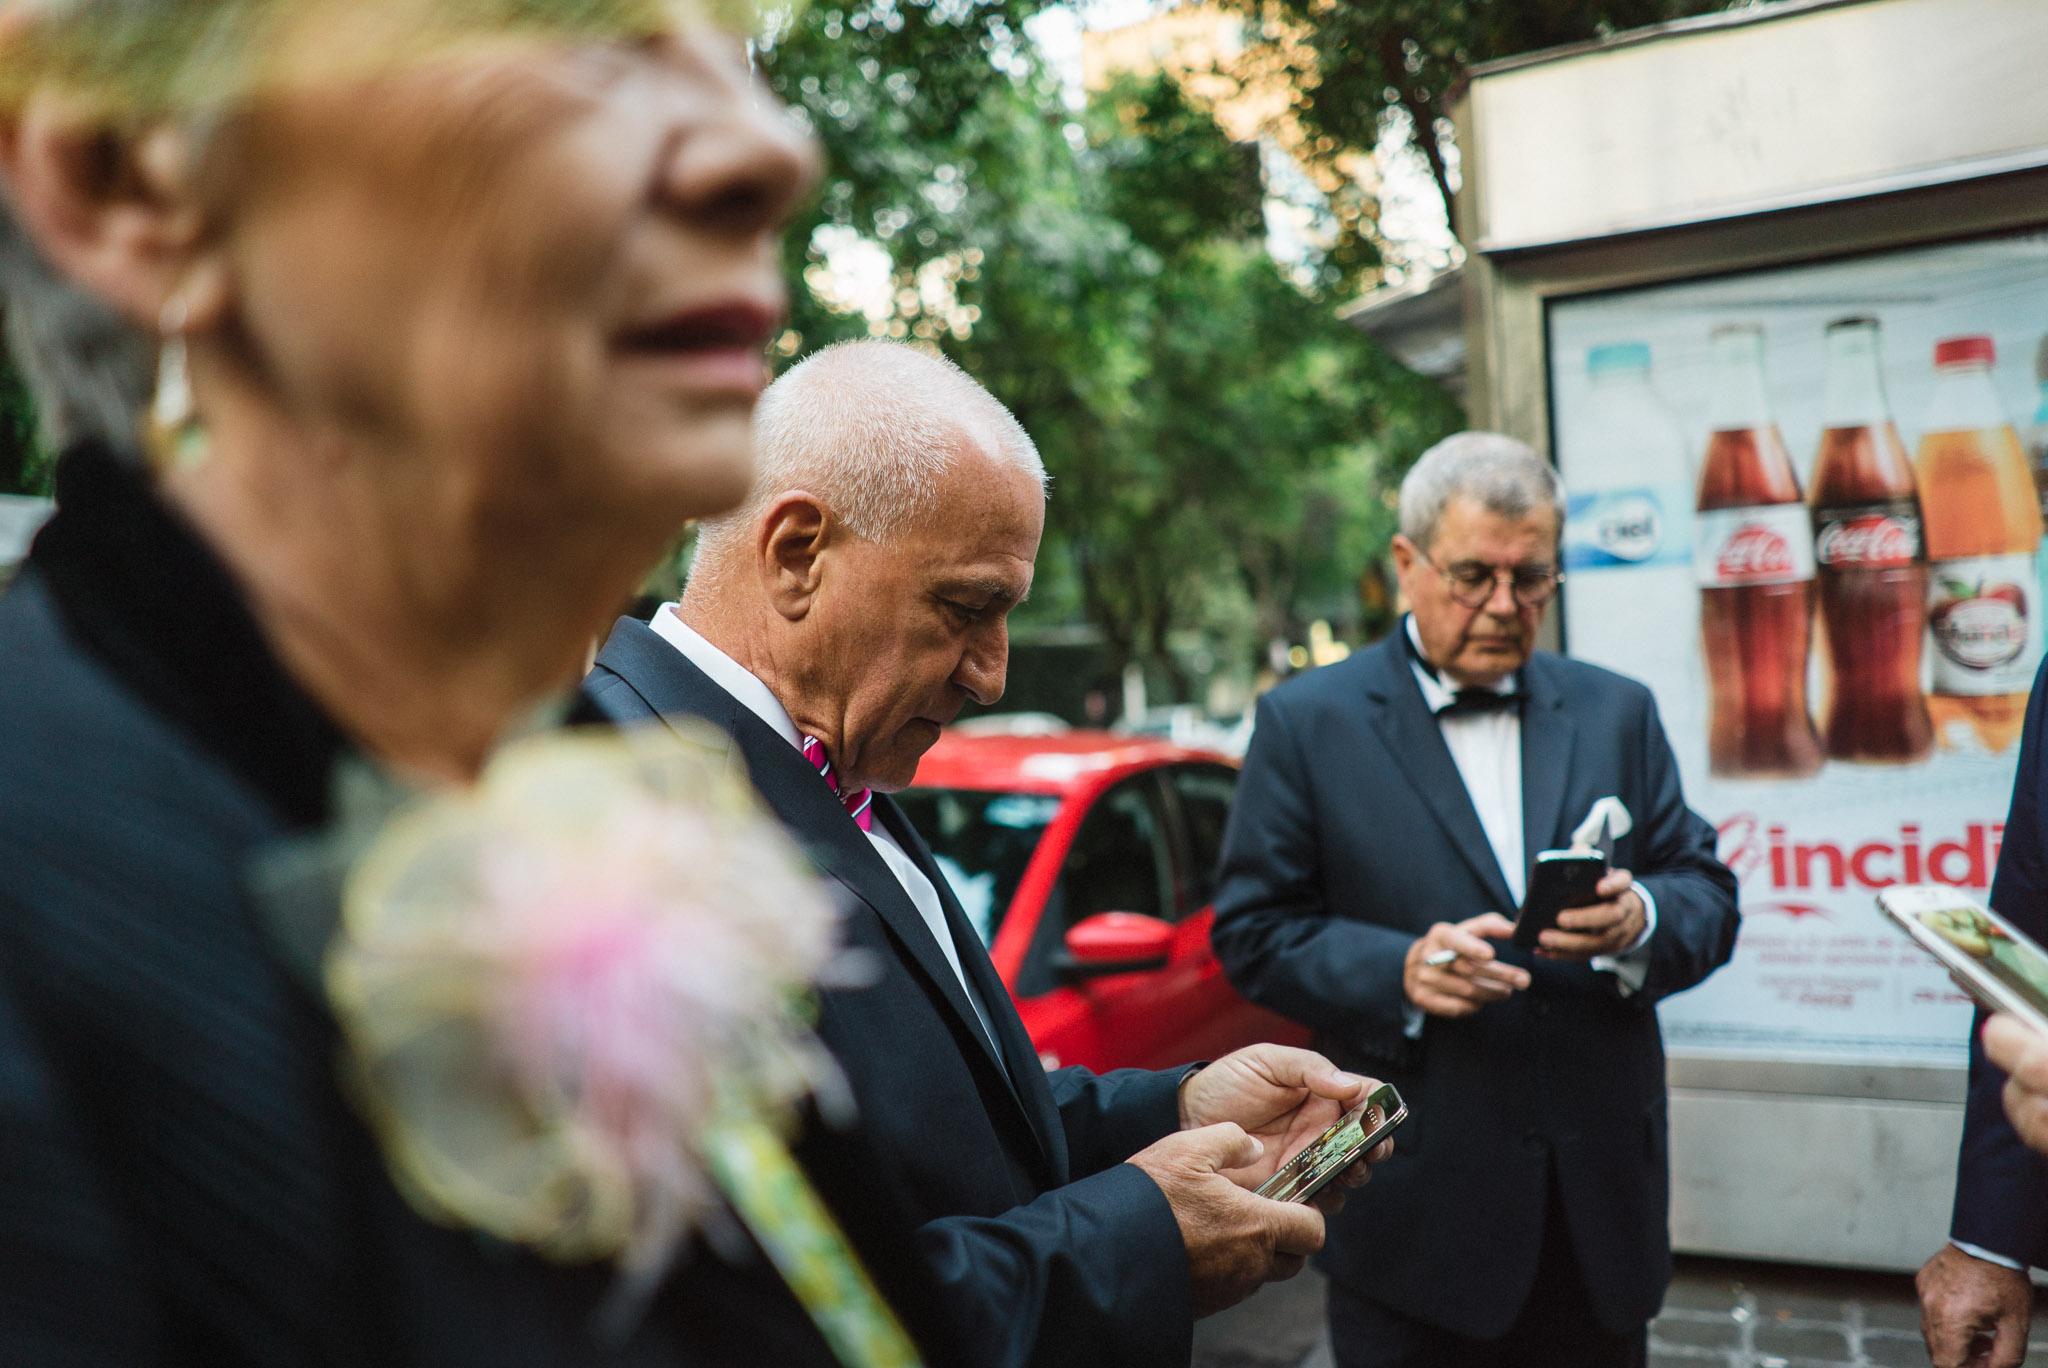 ©www.mauriziosolisbroca.com-20161001maurizio-solis-broca-mexico-canada-wedding-photographer20161001DSC07103-2-Edit.jpg